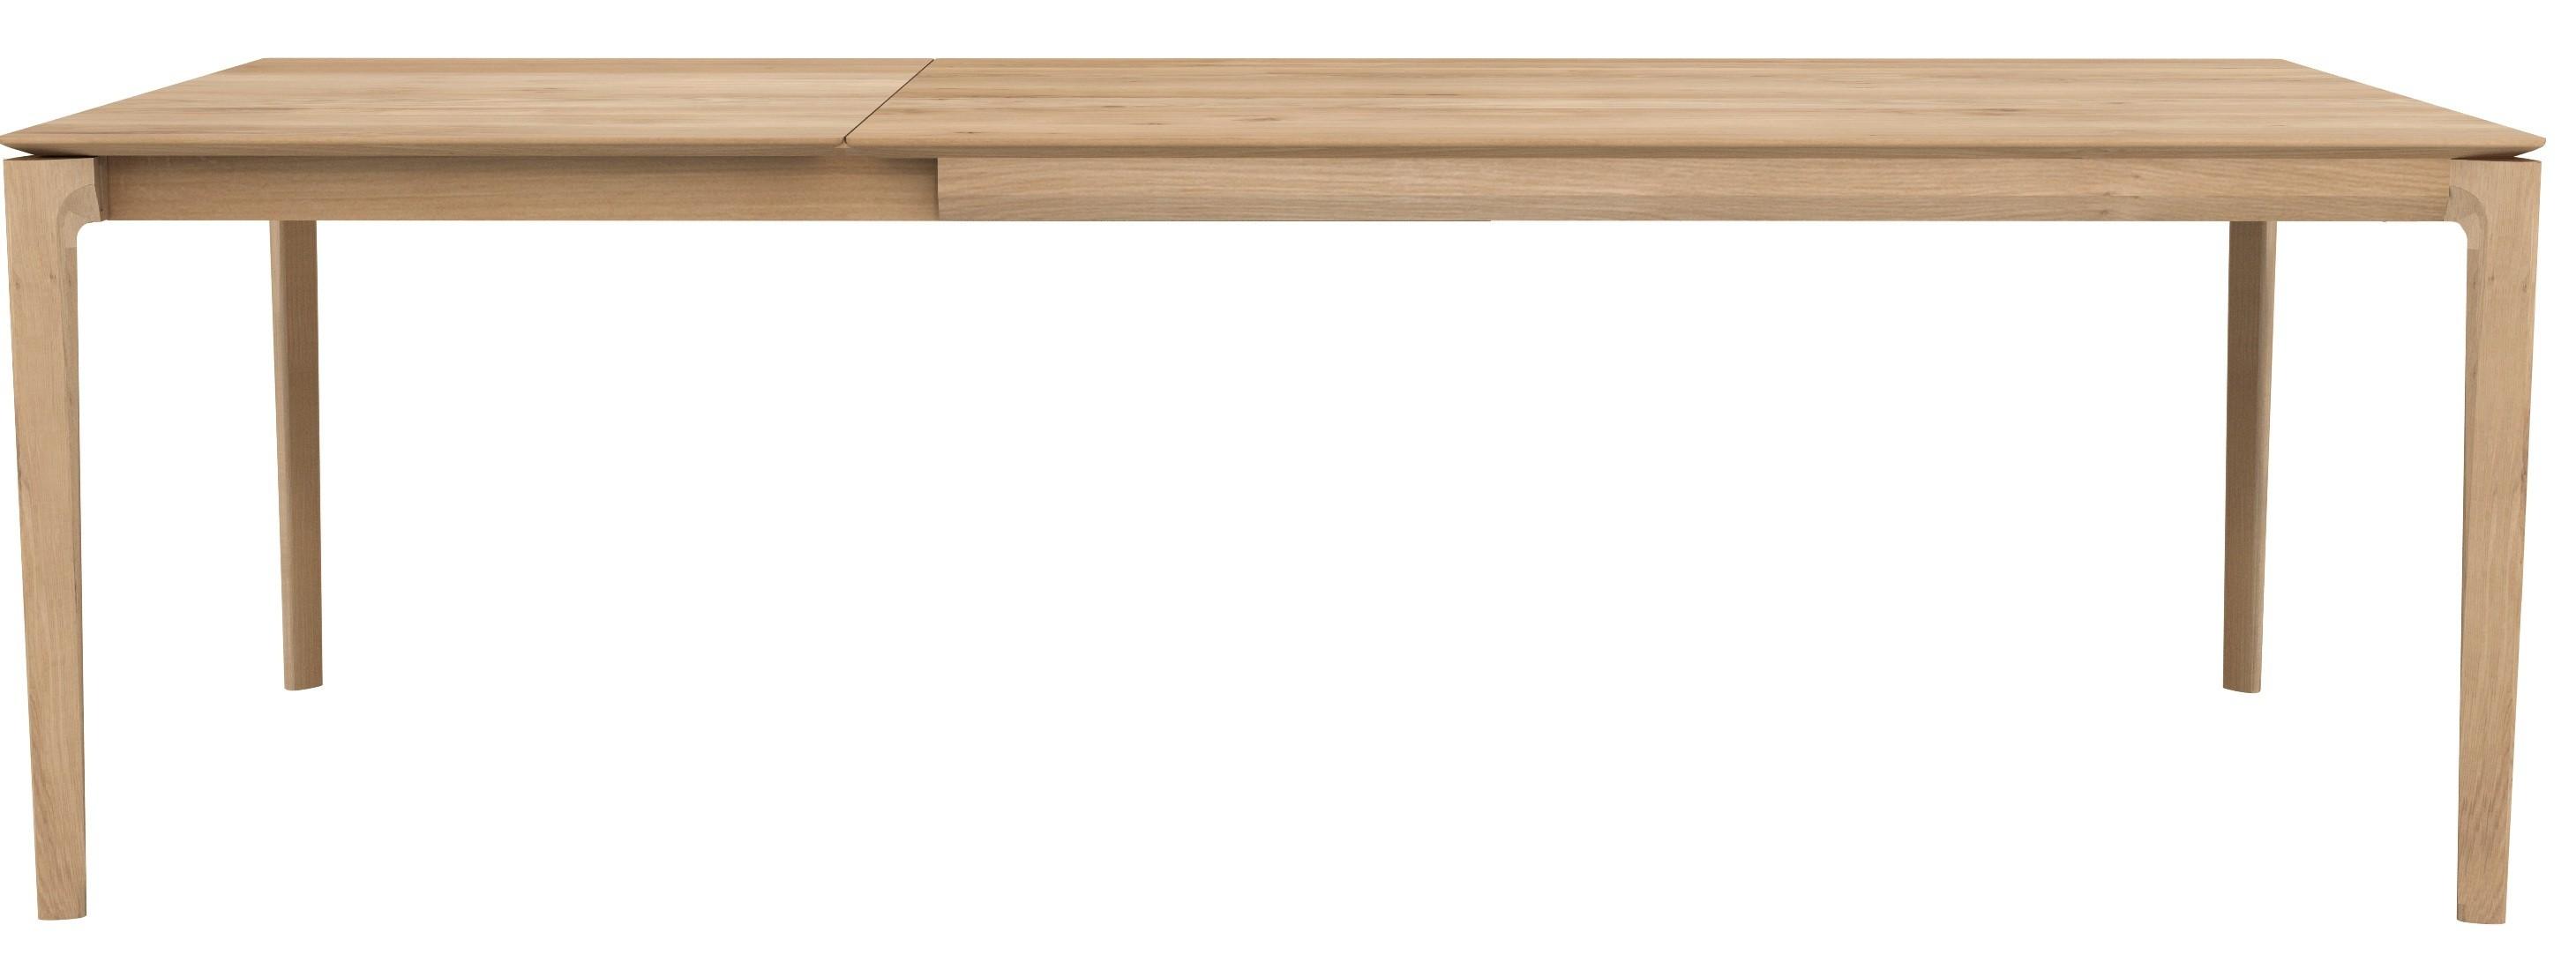 table a rallonge bok en chene d ethnicraft 3 tailles